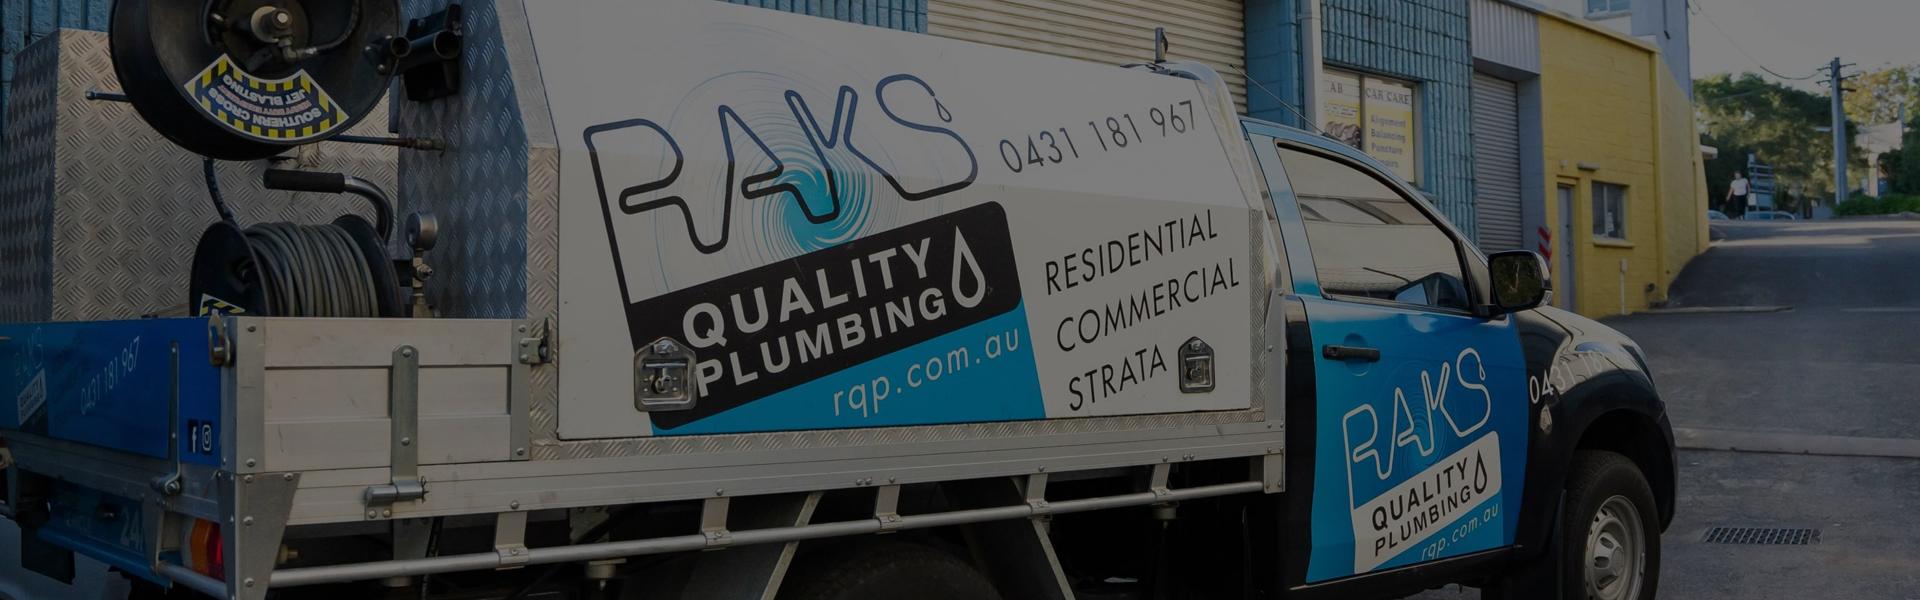 licensed-plumbers-sydney